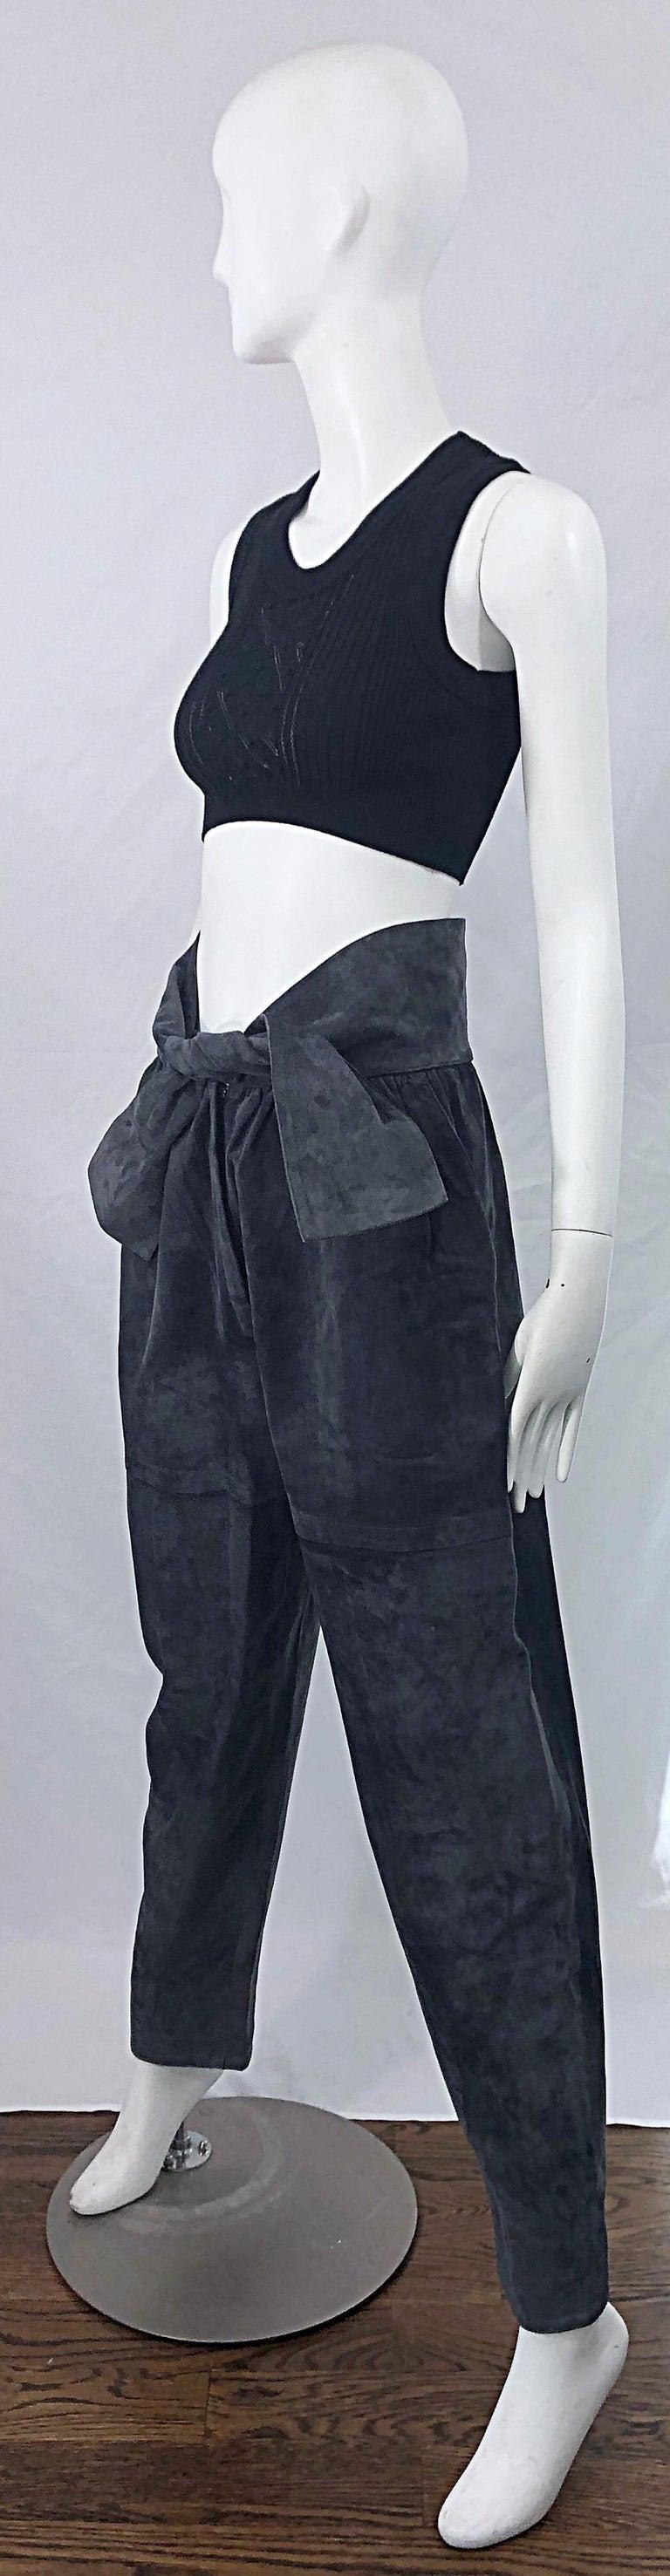 Vintage Yves Saint Laurent YSL 1980s Grey Suede Leather High Waisted Harem Pants For Sale 7